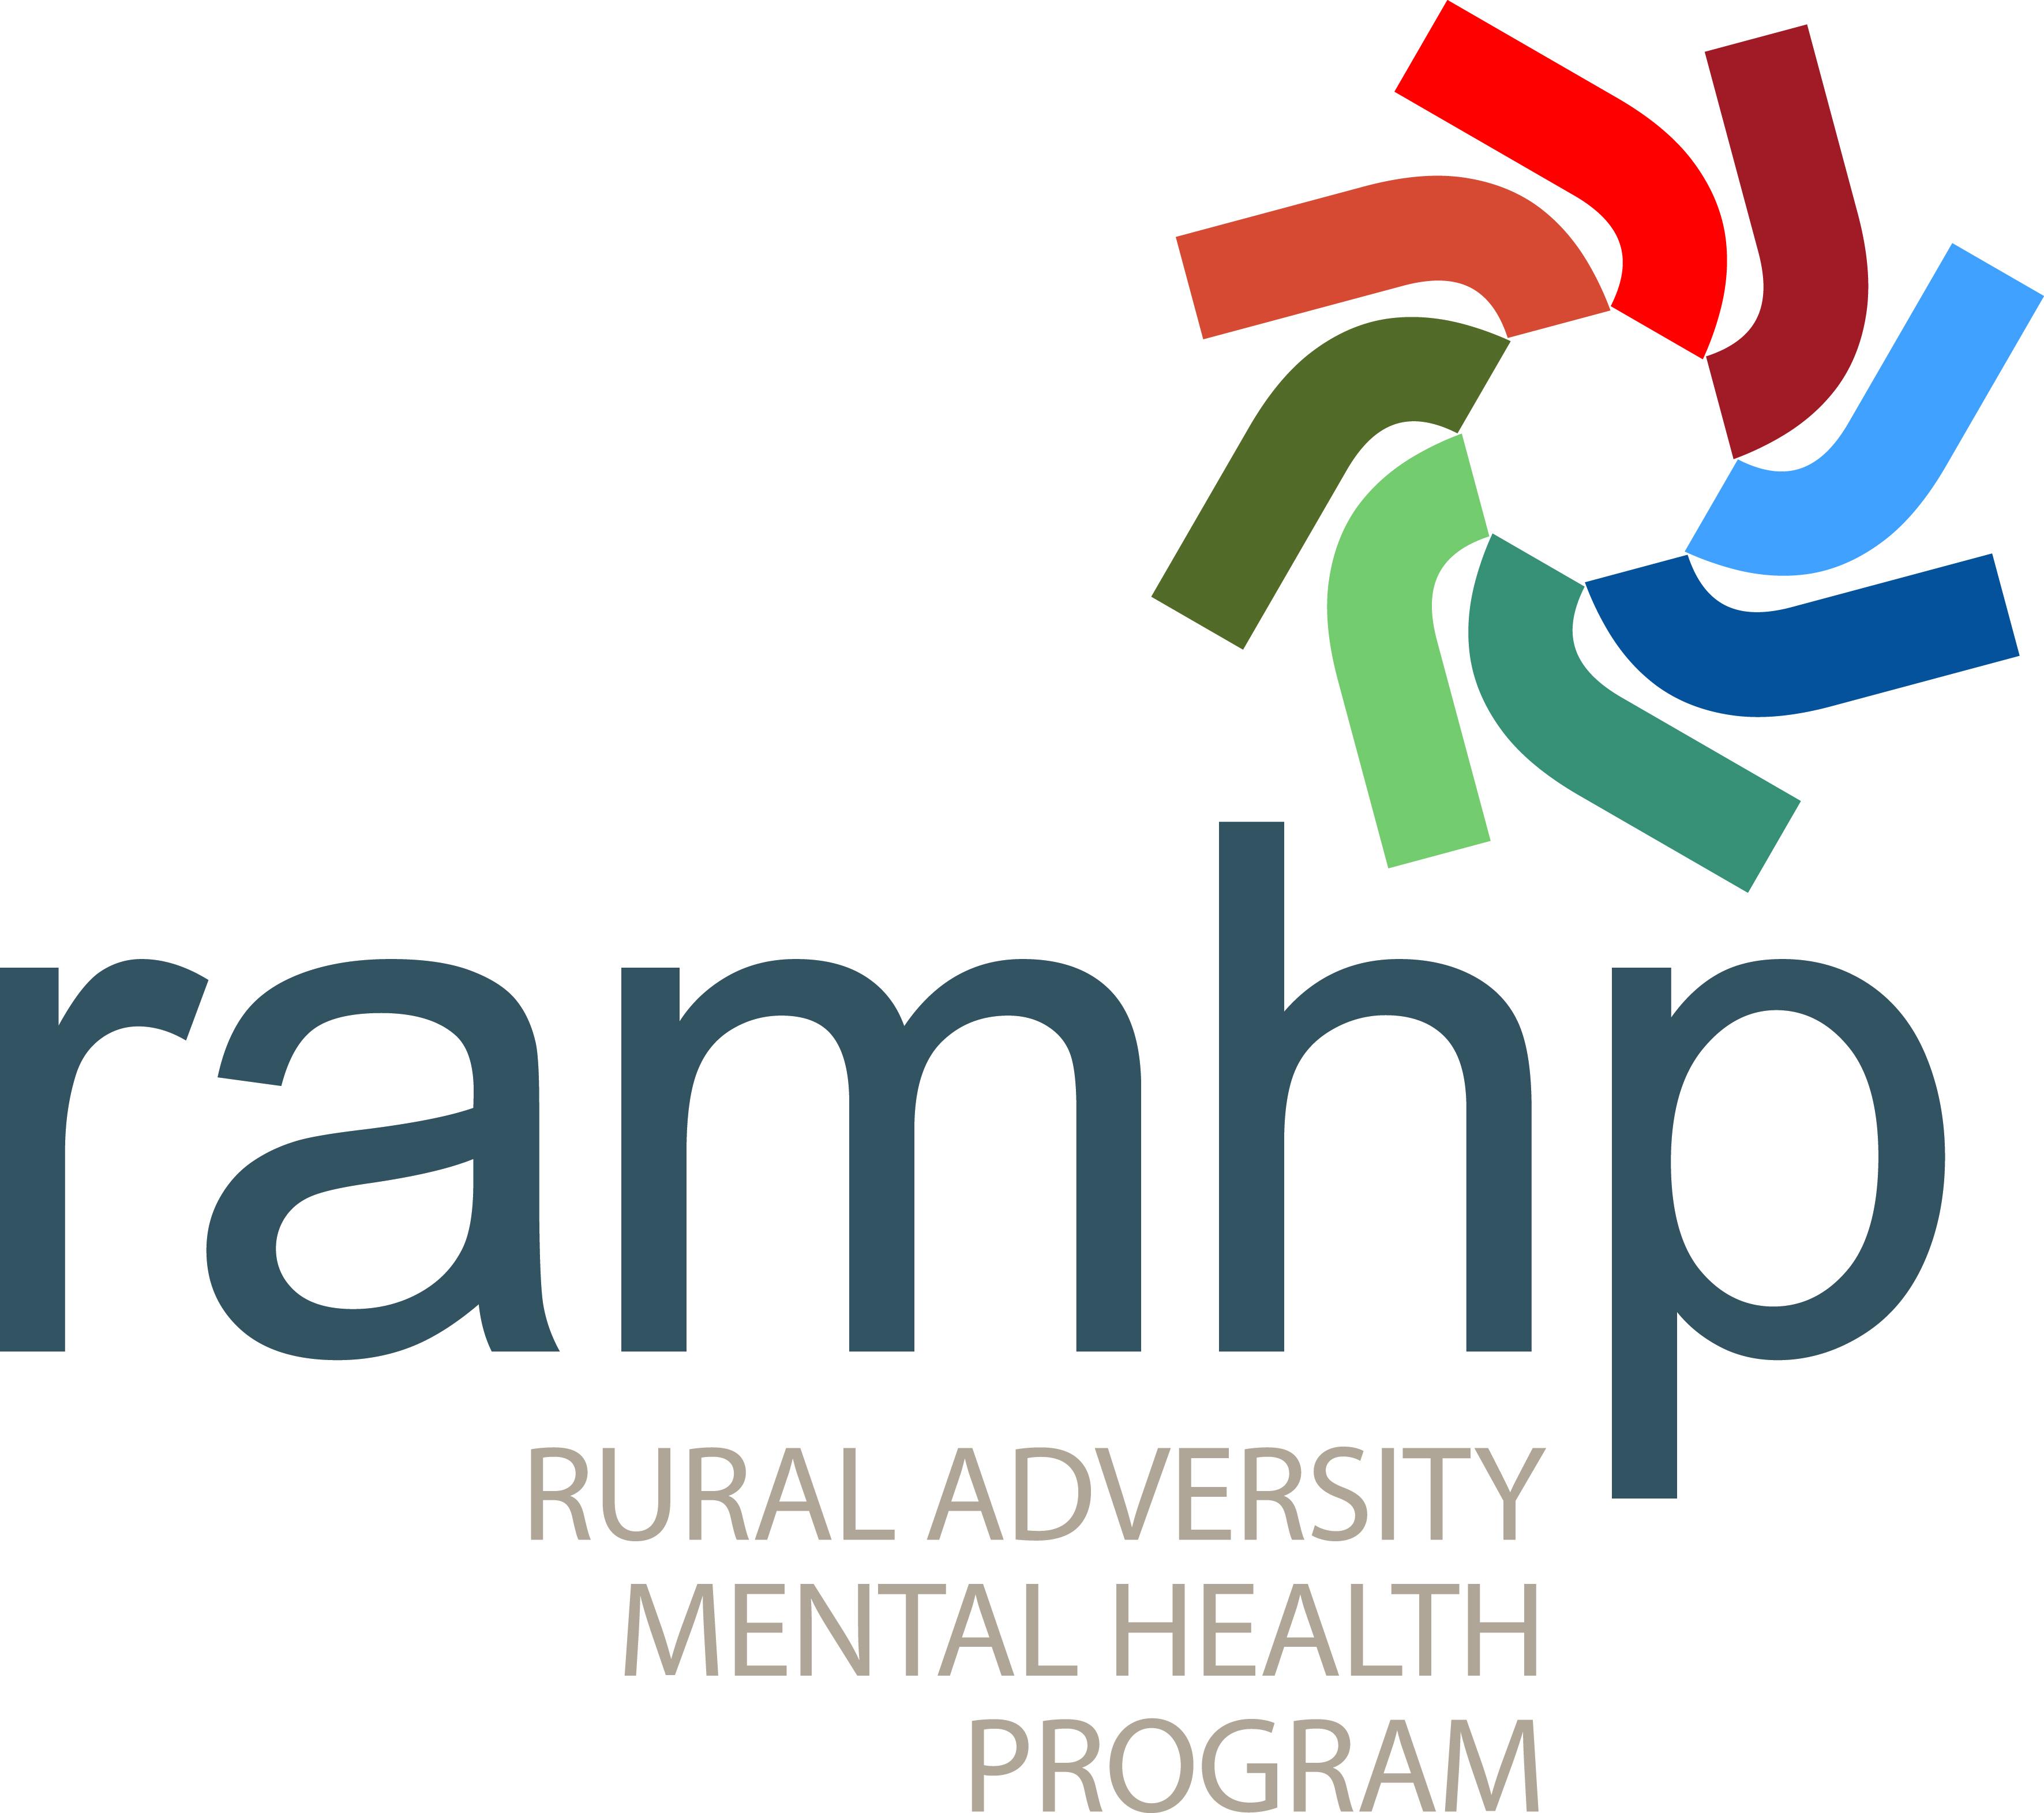 Rural Adversity Mental Health Program (RAMHP) logo